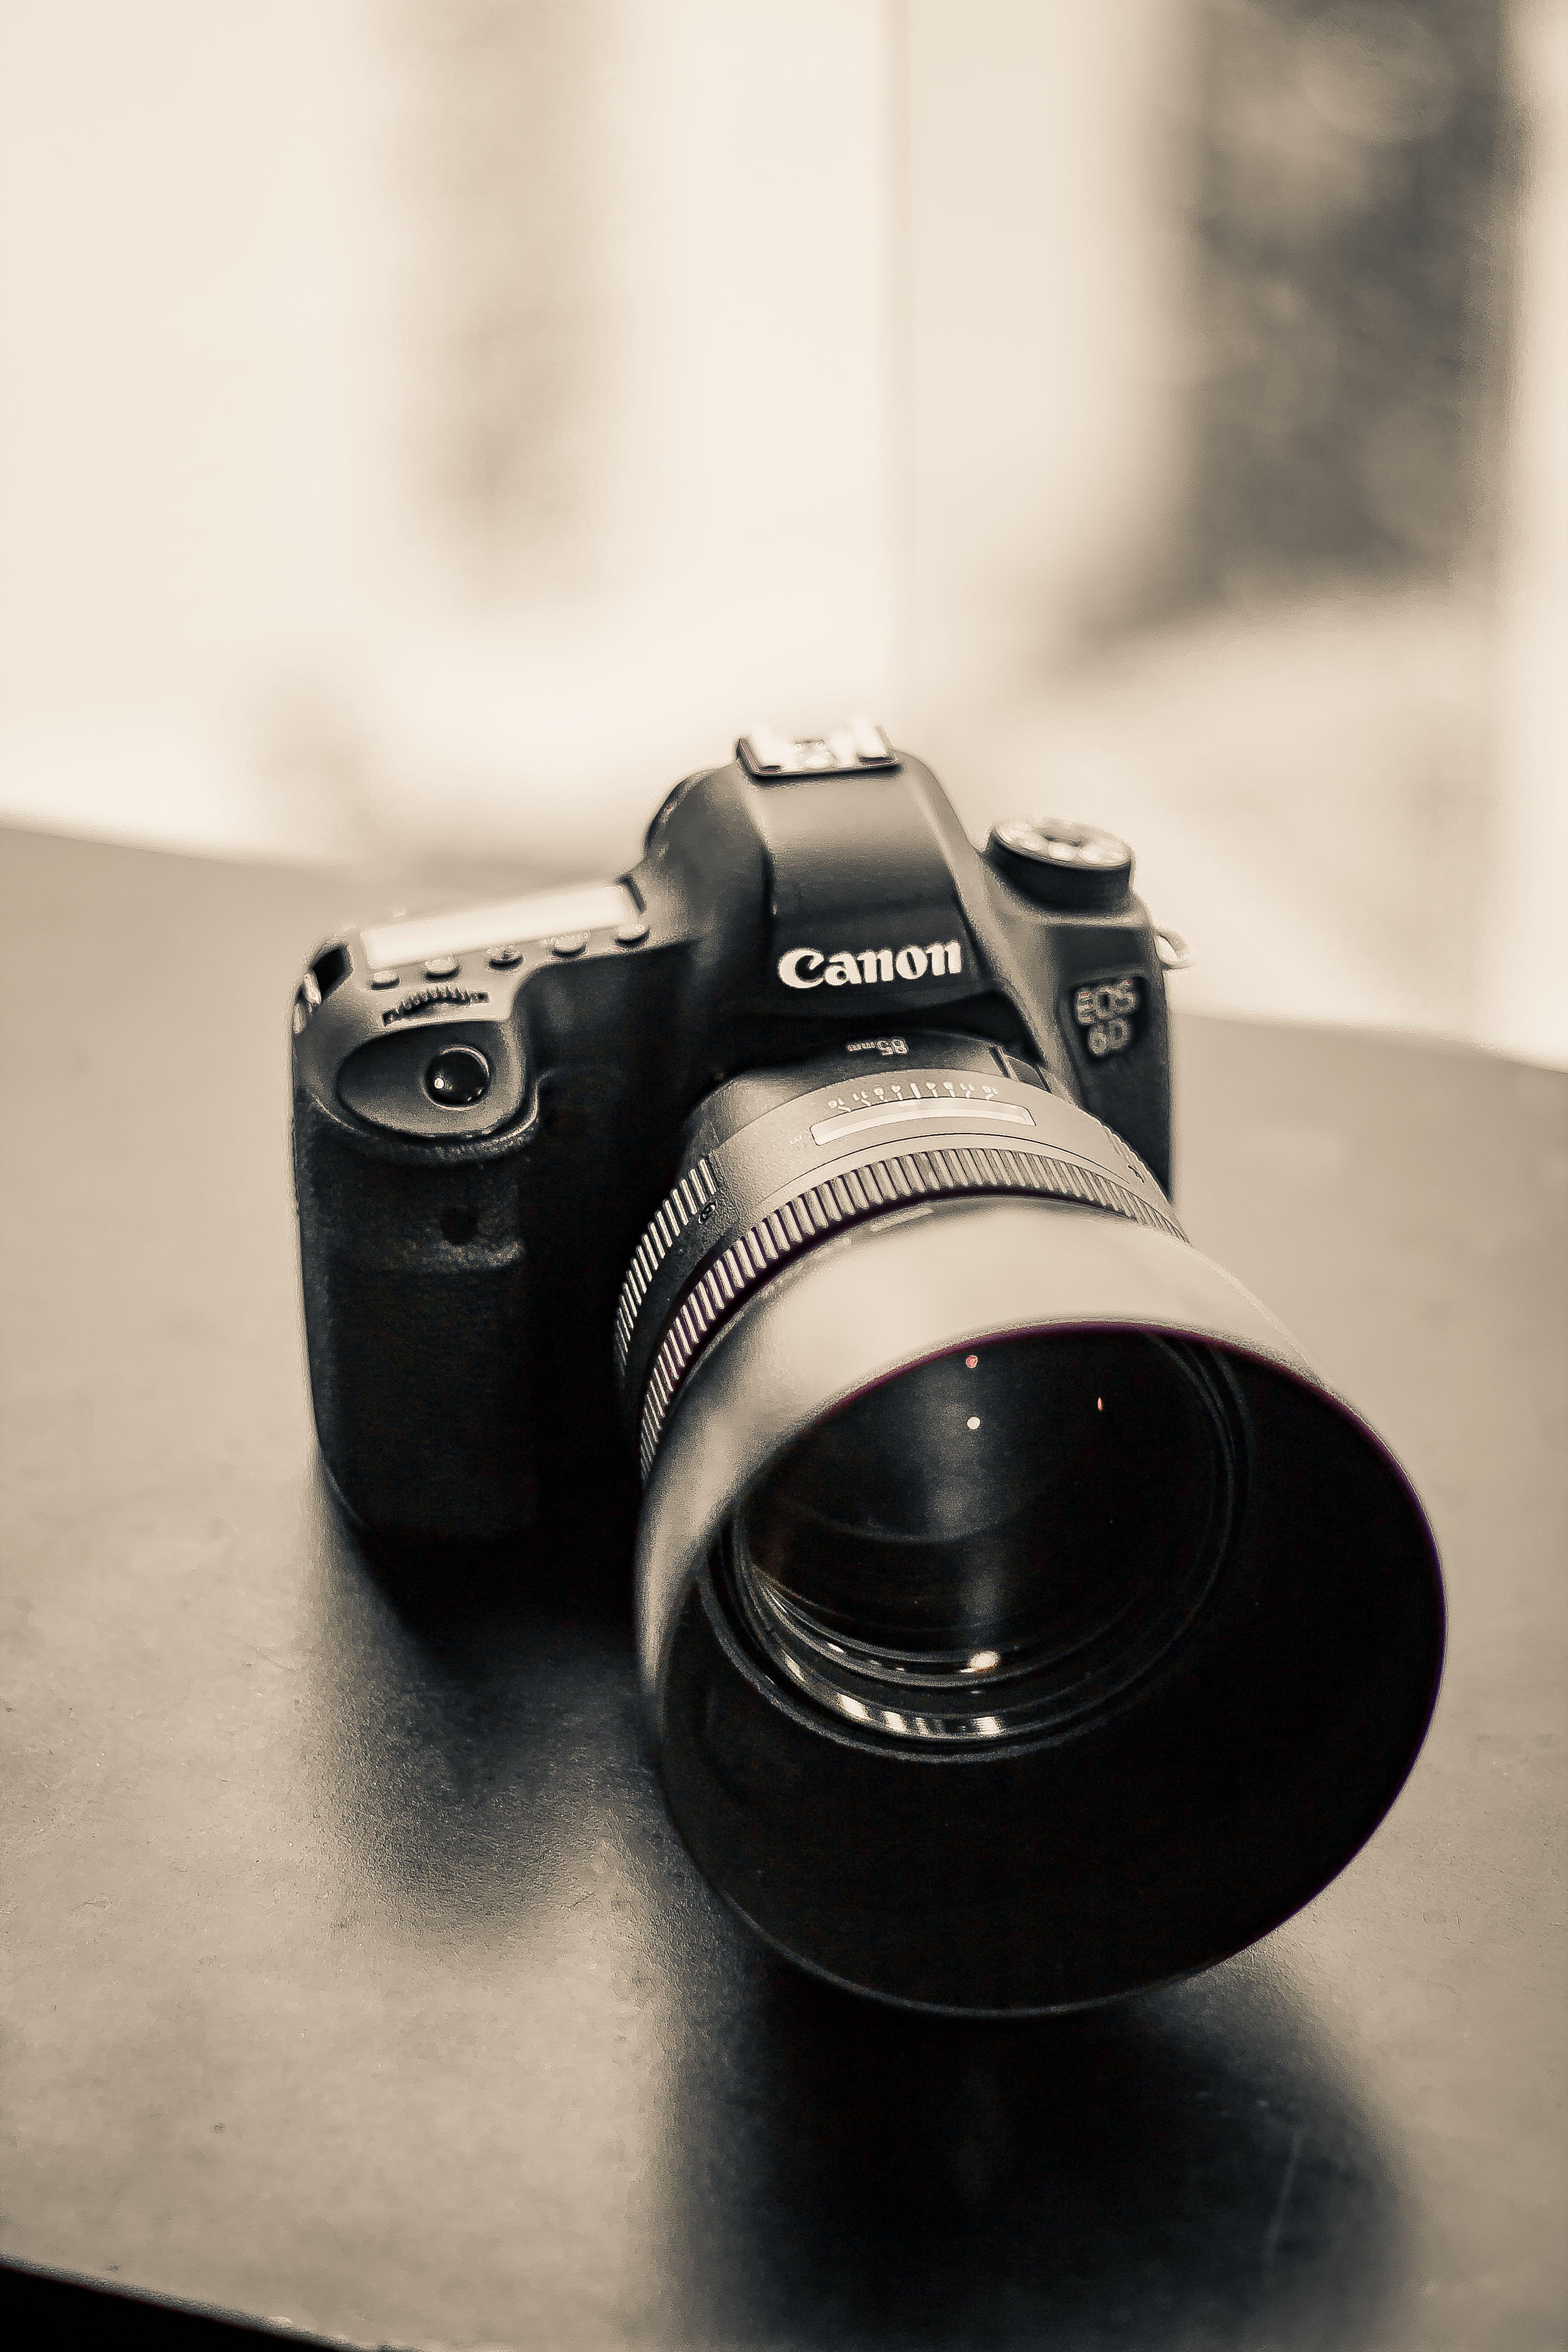 Free stock photo of blurred background, camera, glare, HD wallpaper